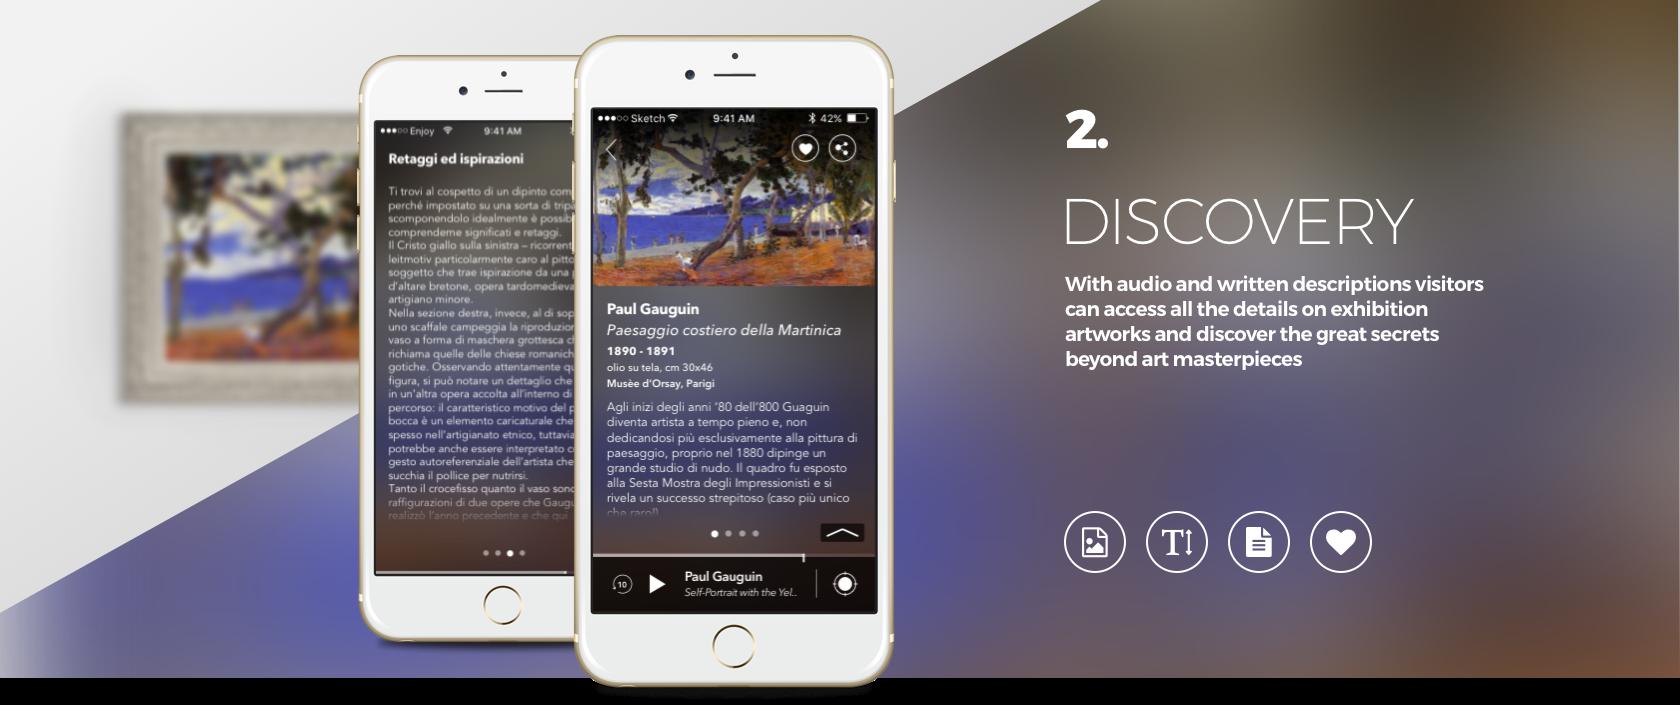 Enjoymuseum. Museum experience design - Fabio Besti - App concept 2